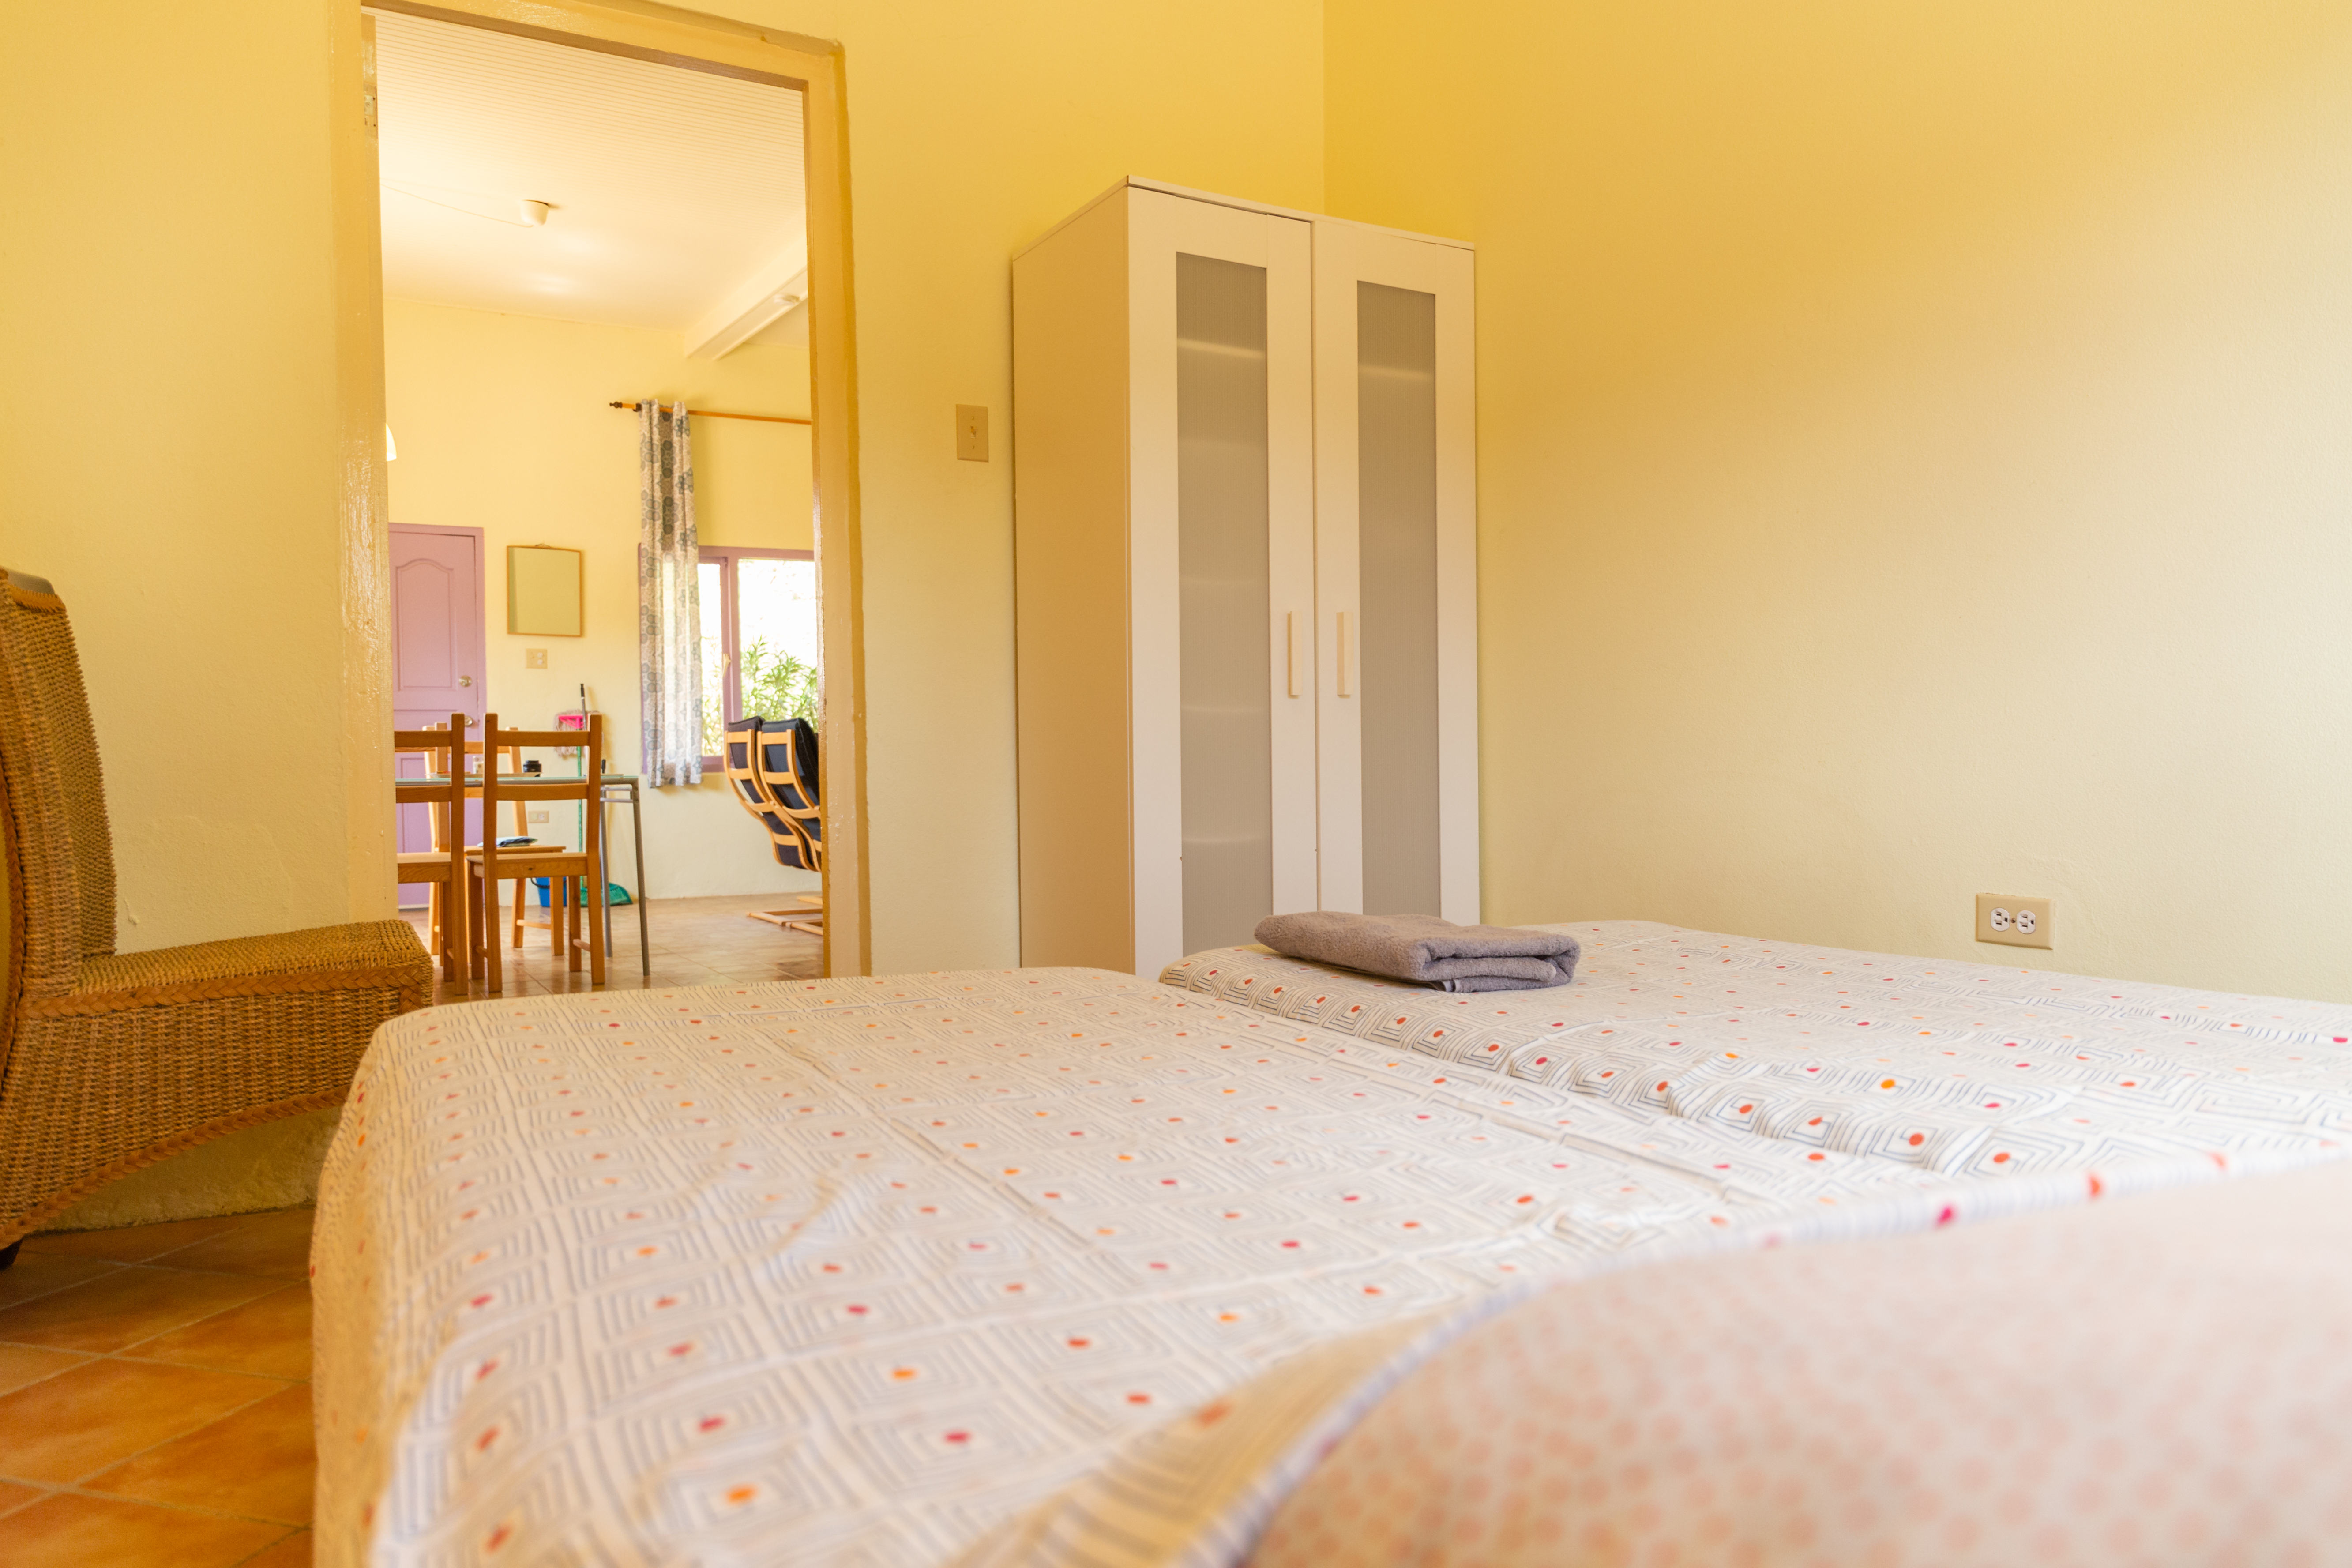 Appartementen 1 t/m 5 slaapkamer